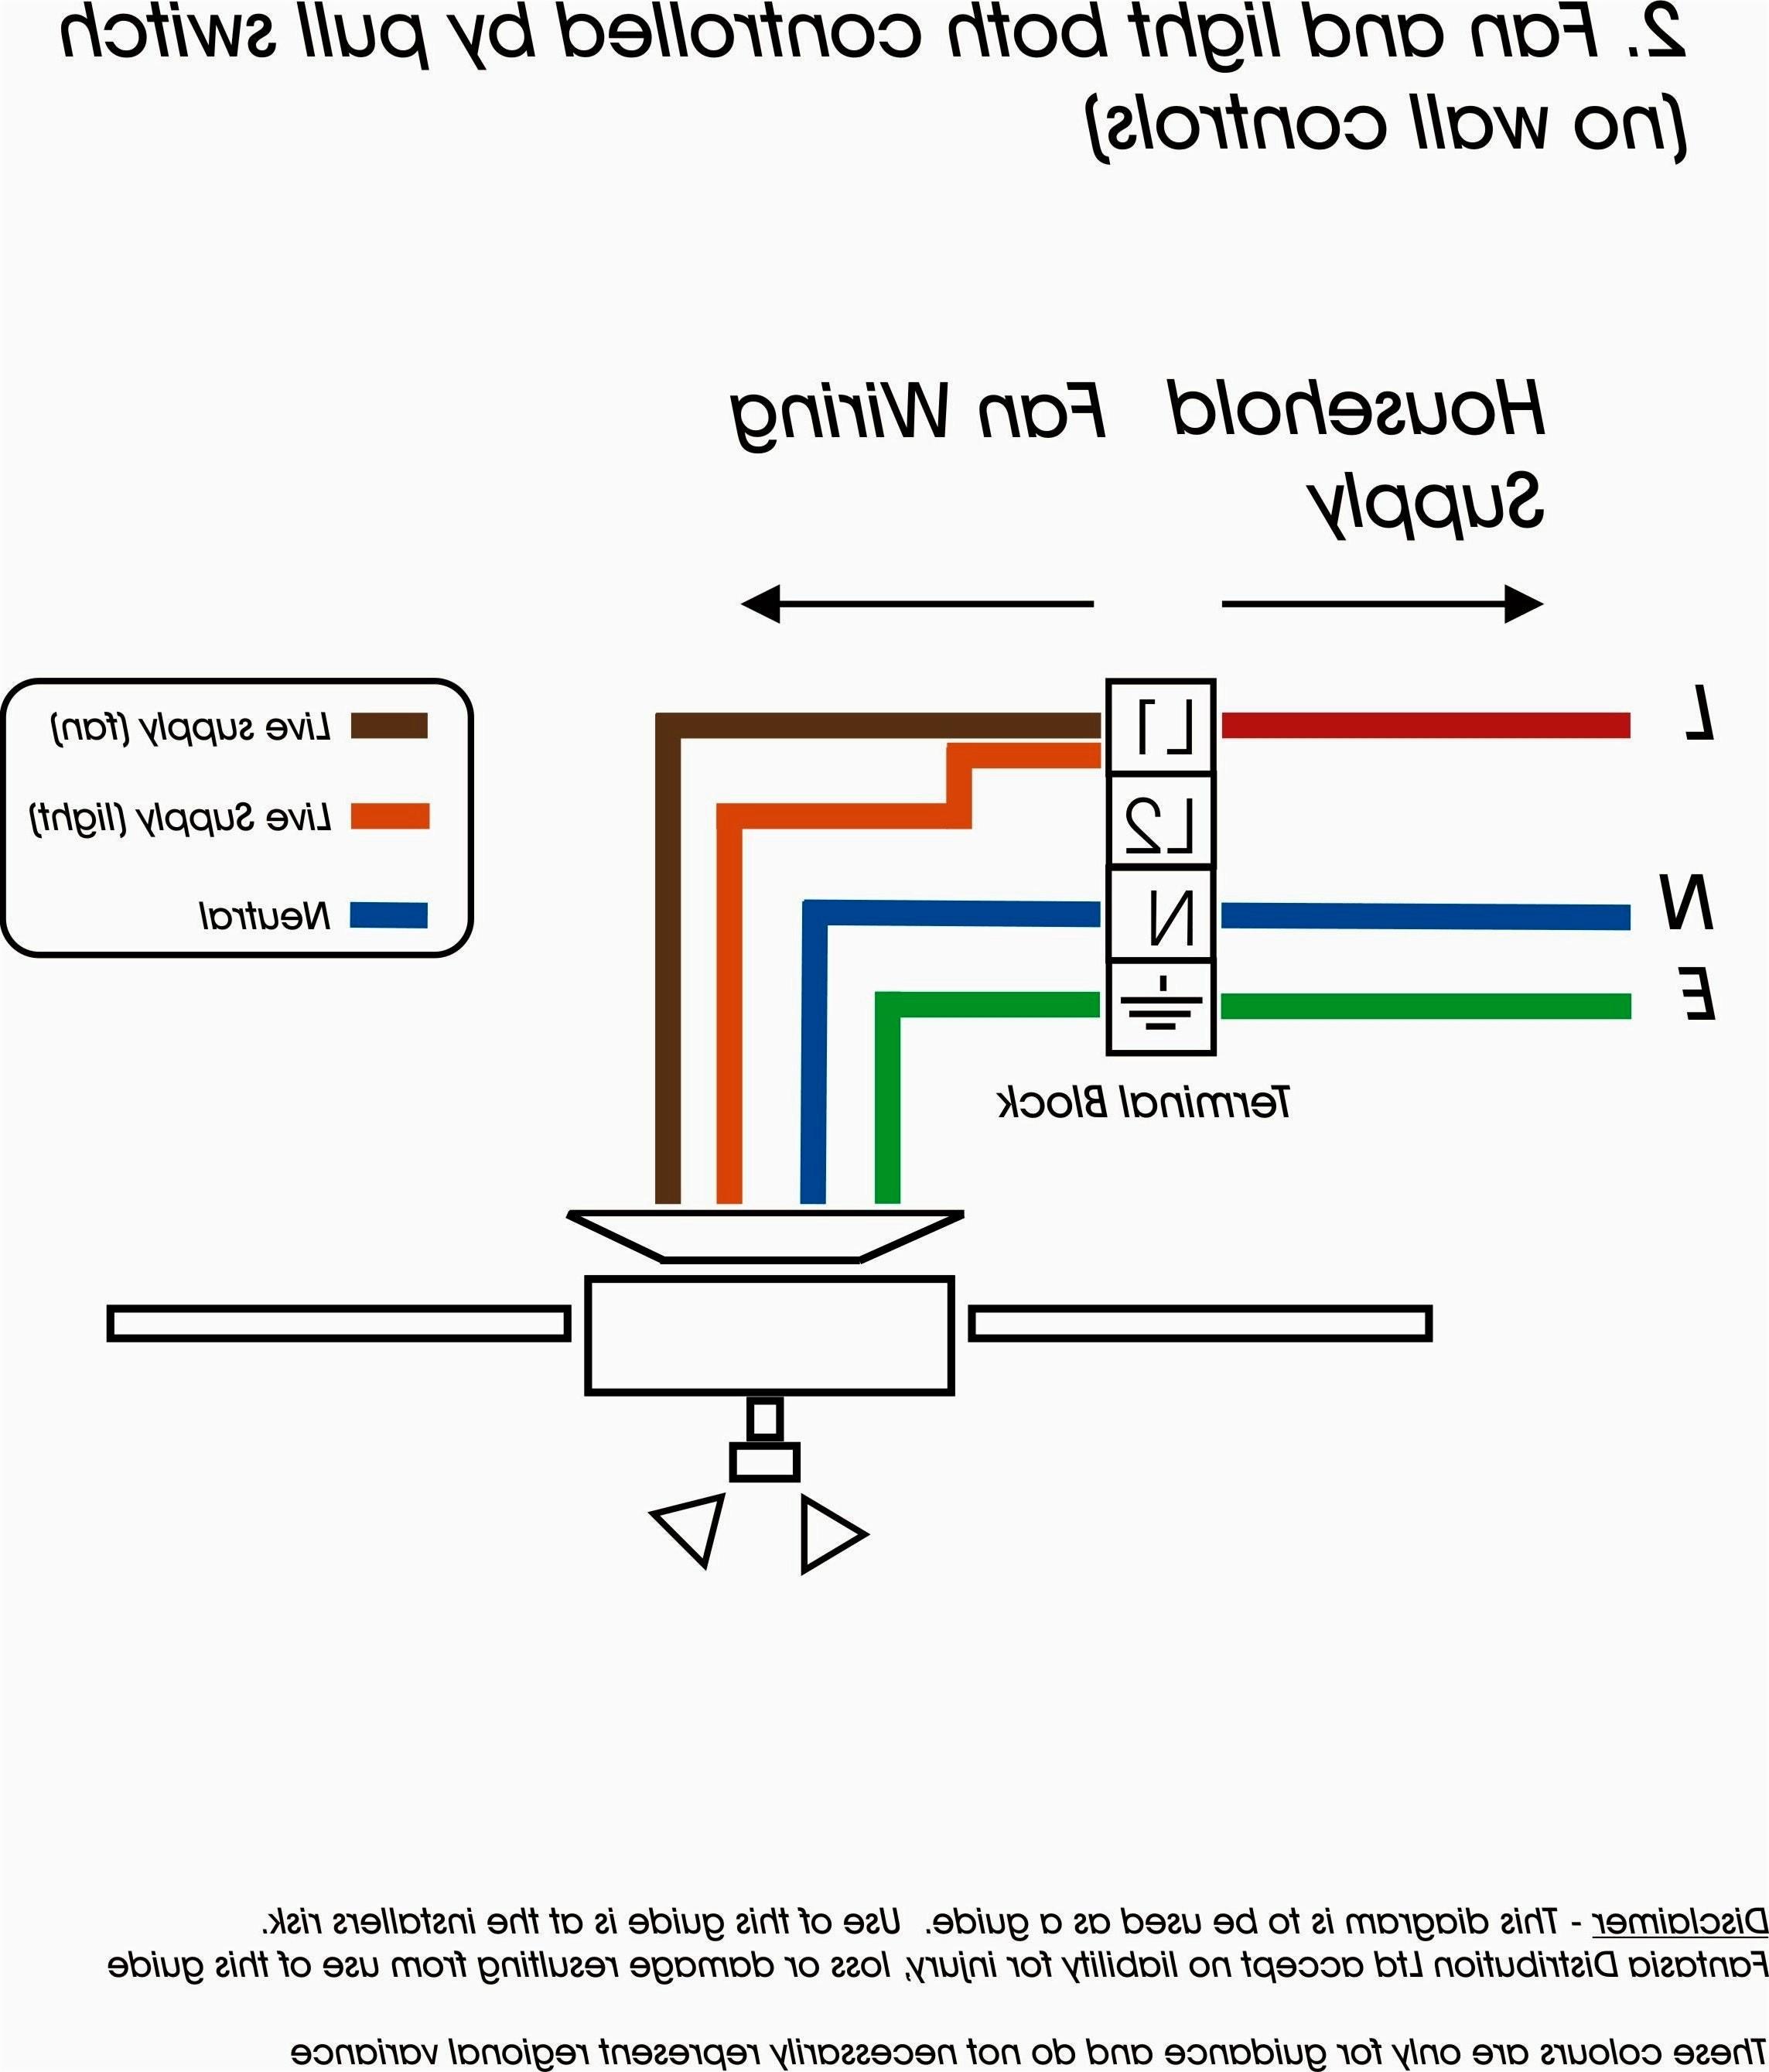 quorum ceiling fan wiring diagram online wiring diagramharbor breeze ceiling fan wire diagramsmall resolution of quorum ceiling fan wiring diagram download 5 blade